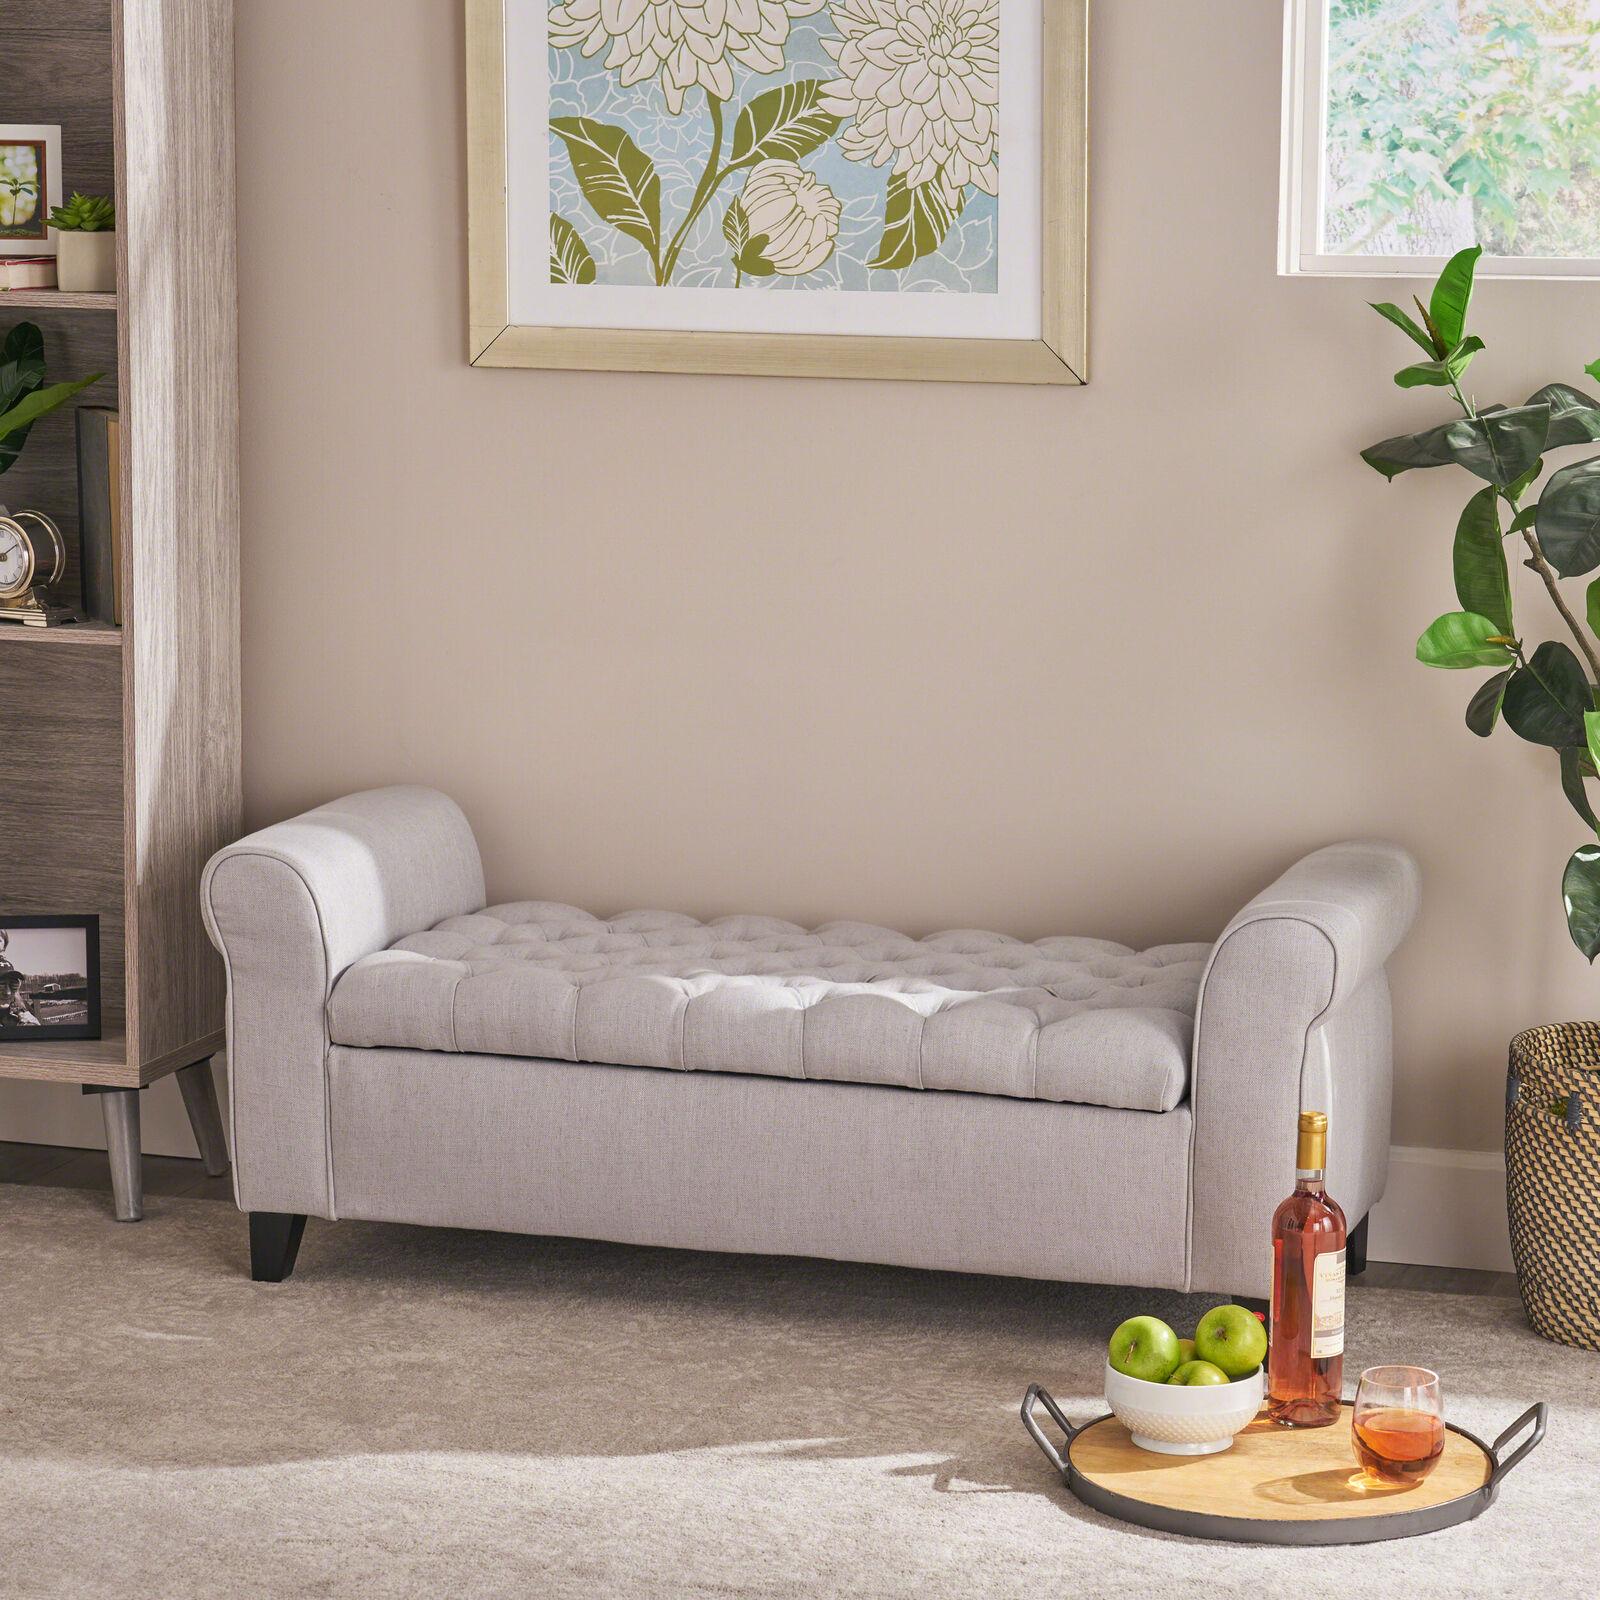 Lamara Contemporary Rolled Arm Fabric Storage Ottoman Bench Benches, Stools & Bar Stools